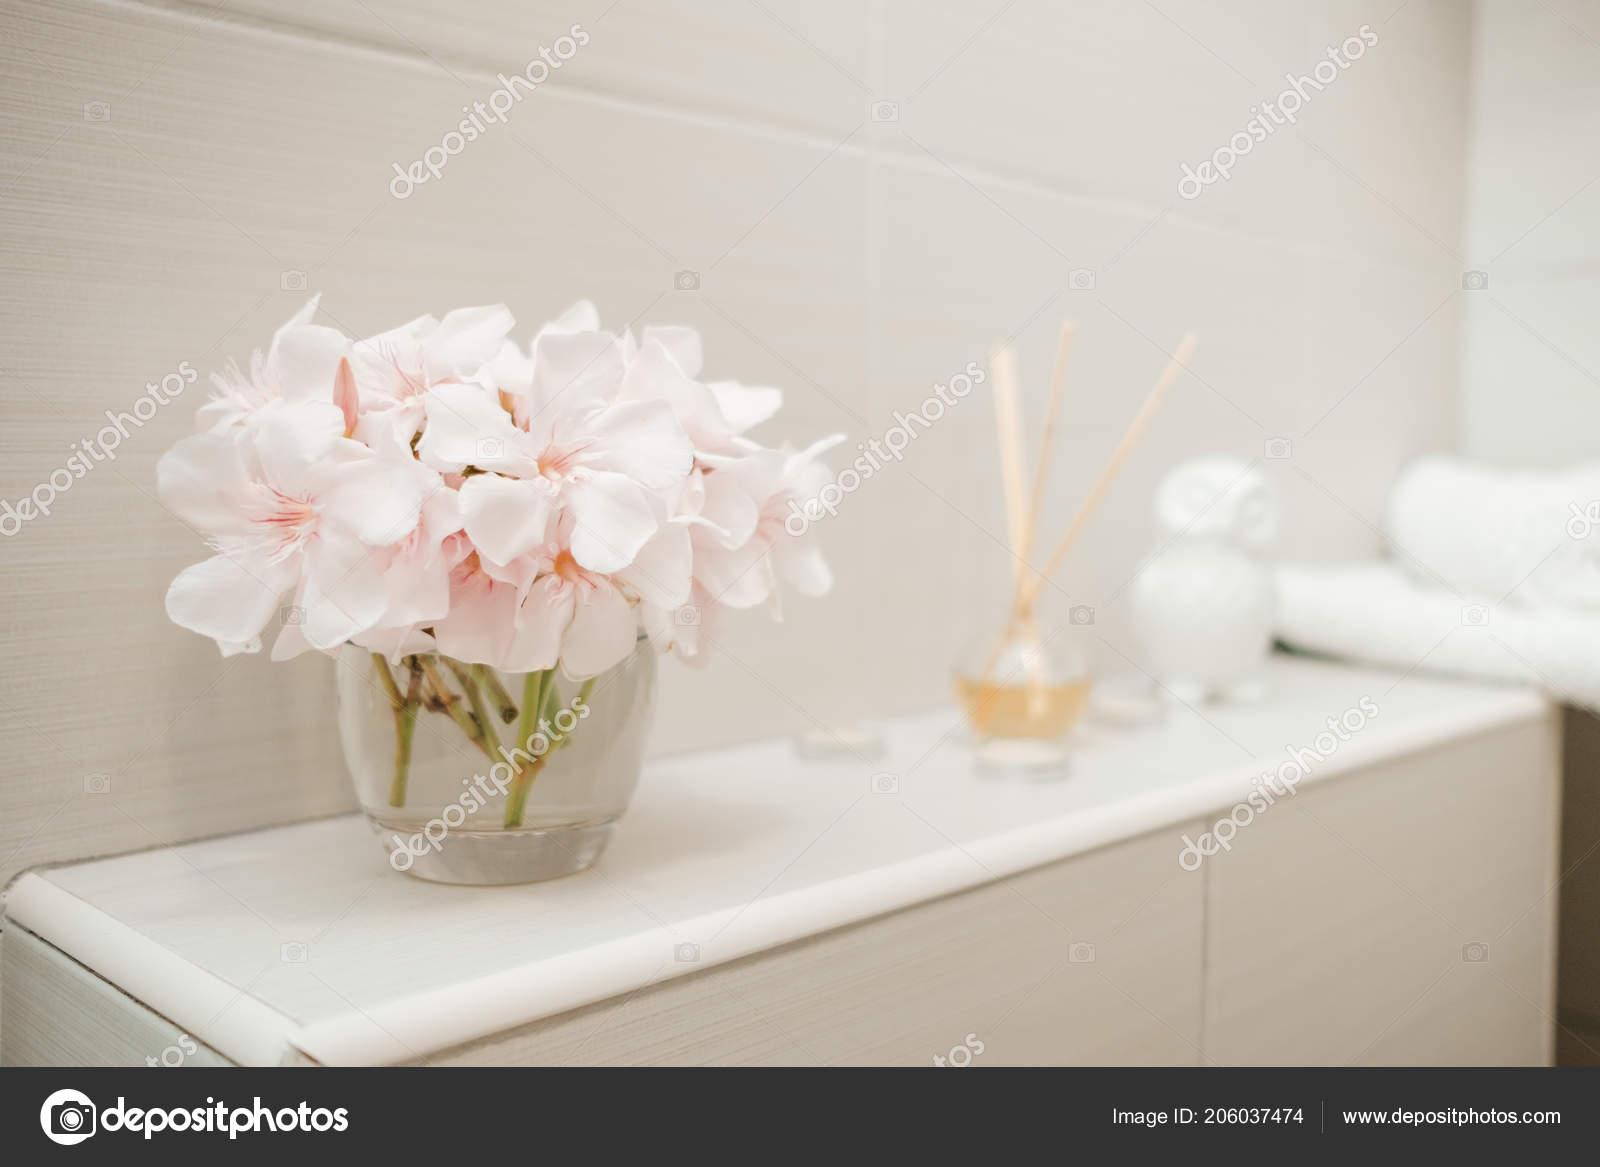 Clean Towels Flowers Spa Bath Cosmetic Bathroom — Stock Photo ...